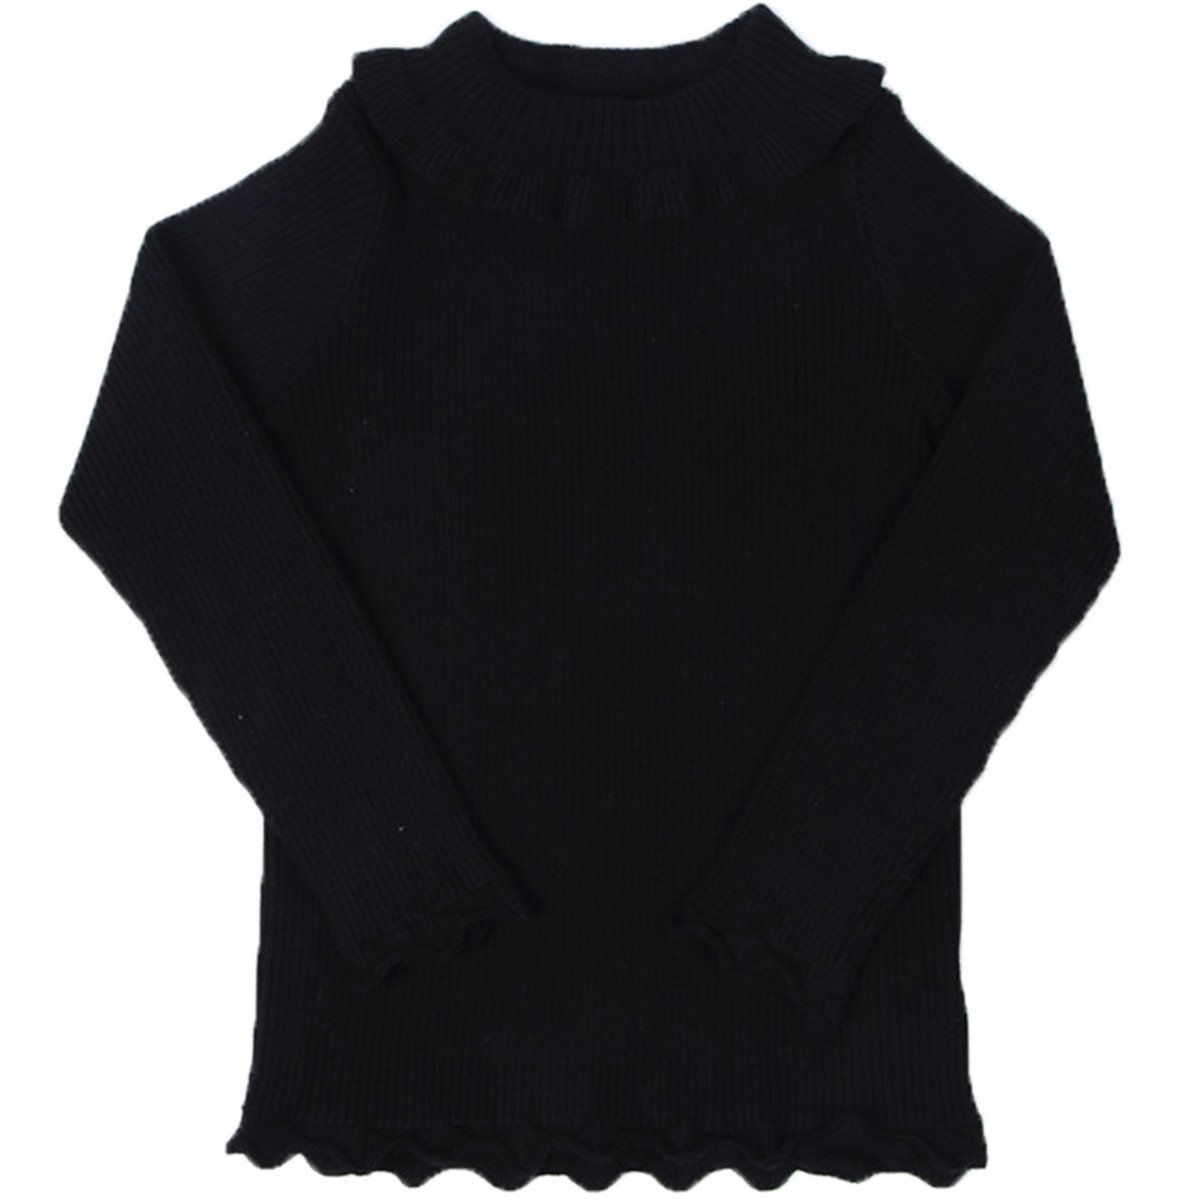 Little Girls Long Sleeve Sweater High Neck Ruflle Fine Knit Sweatshirt Pullover 90cm